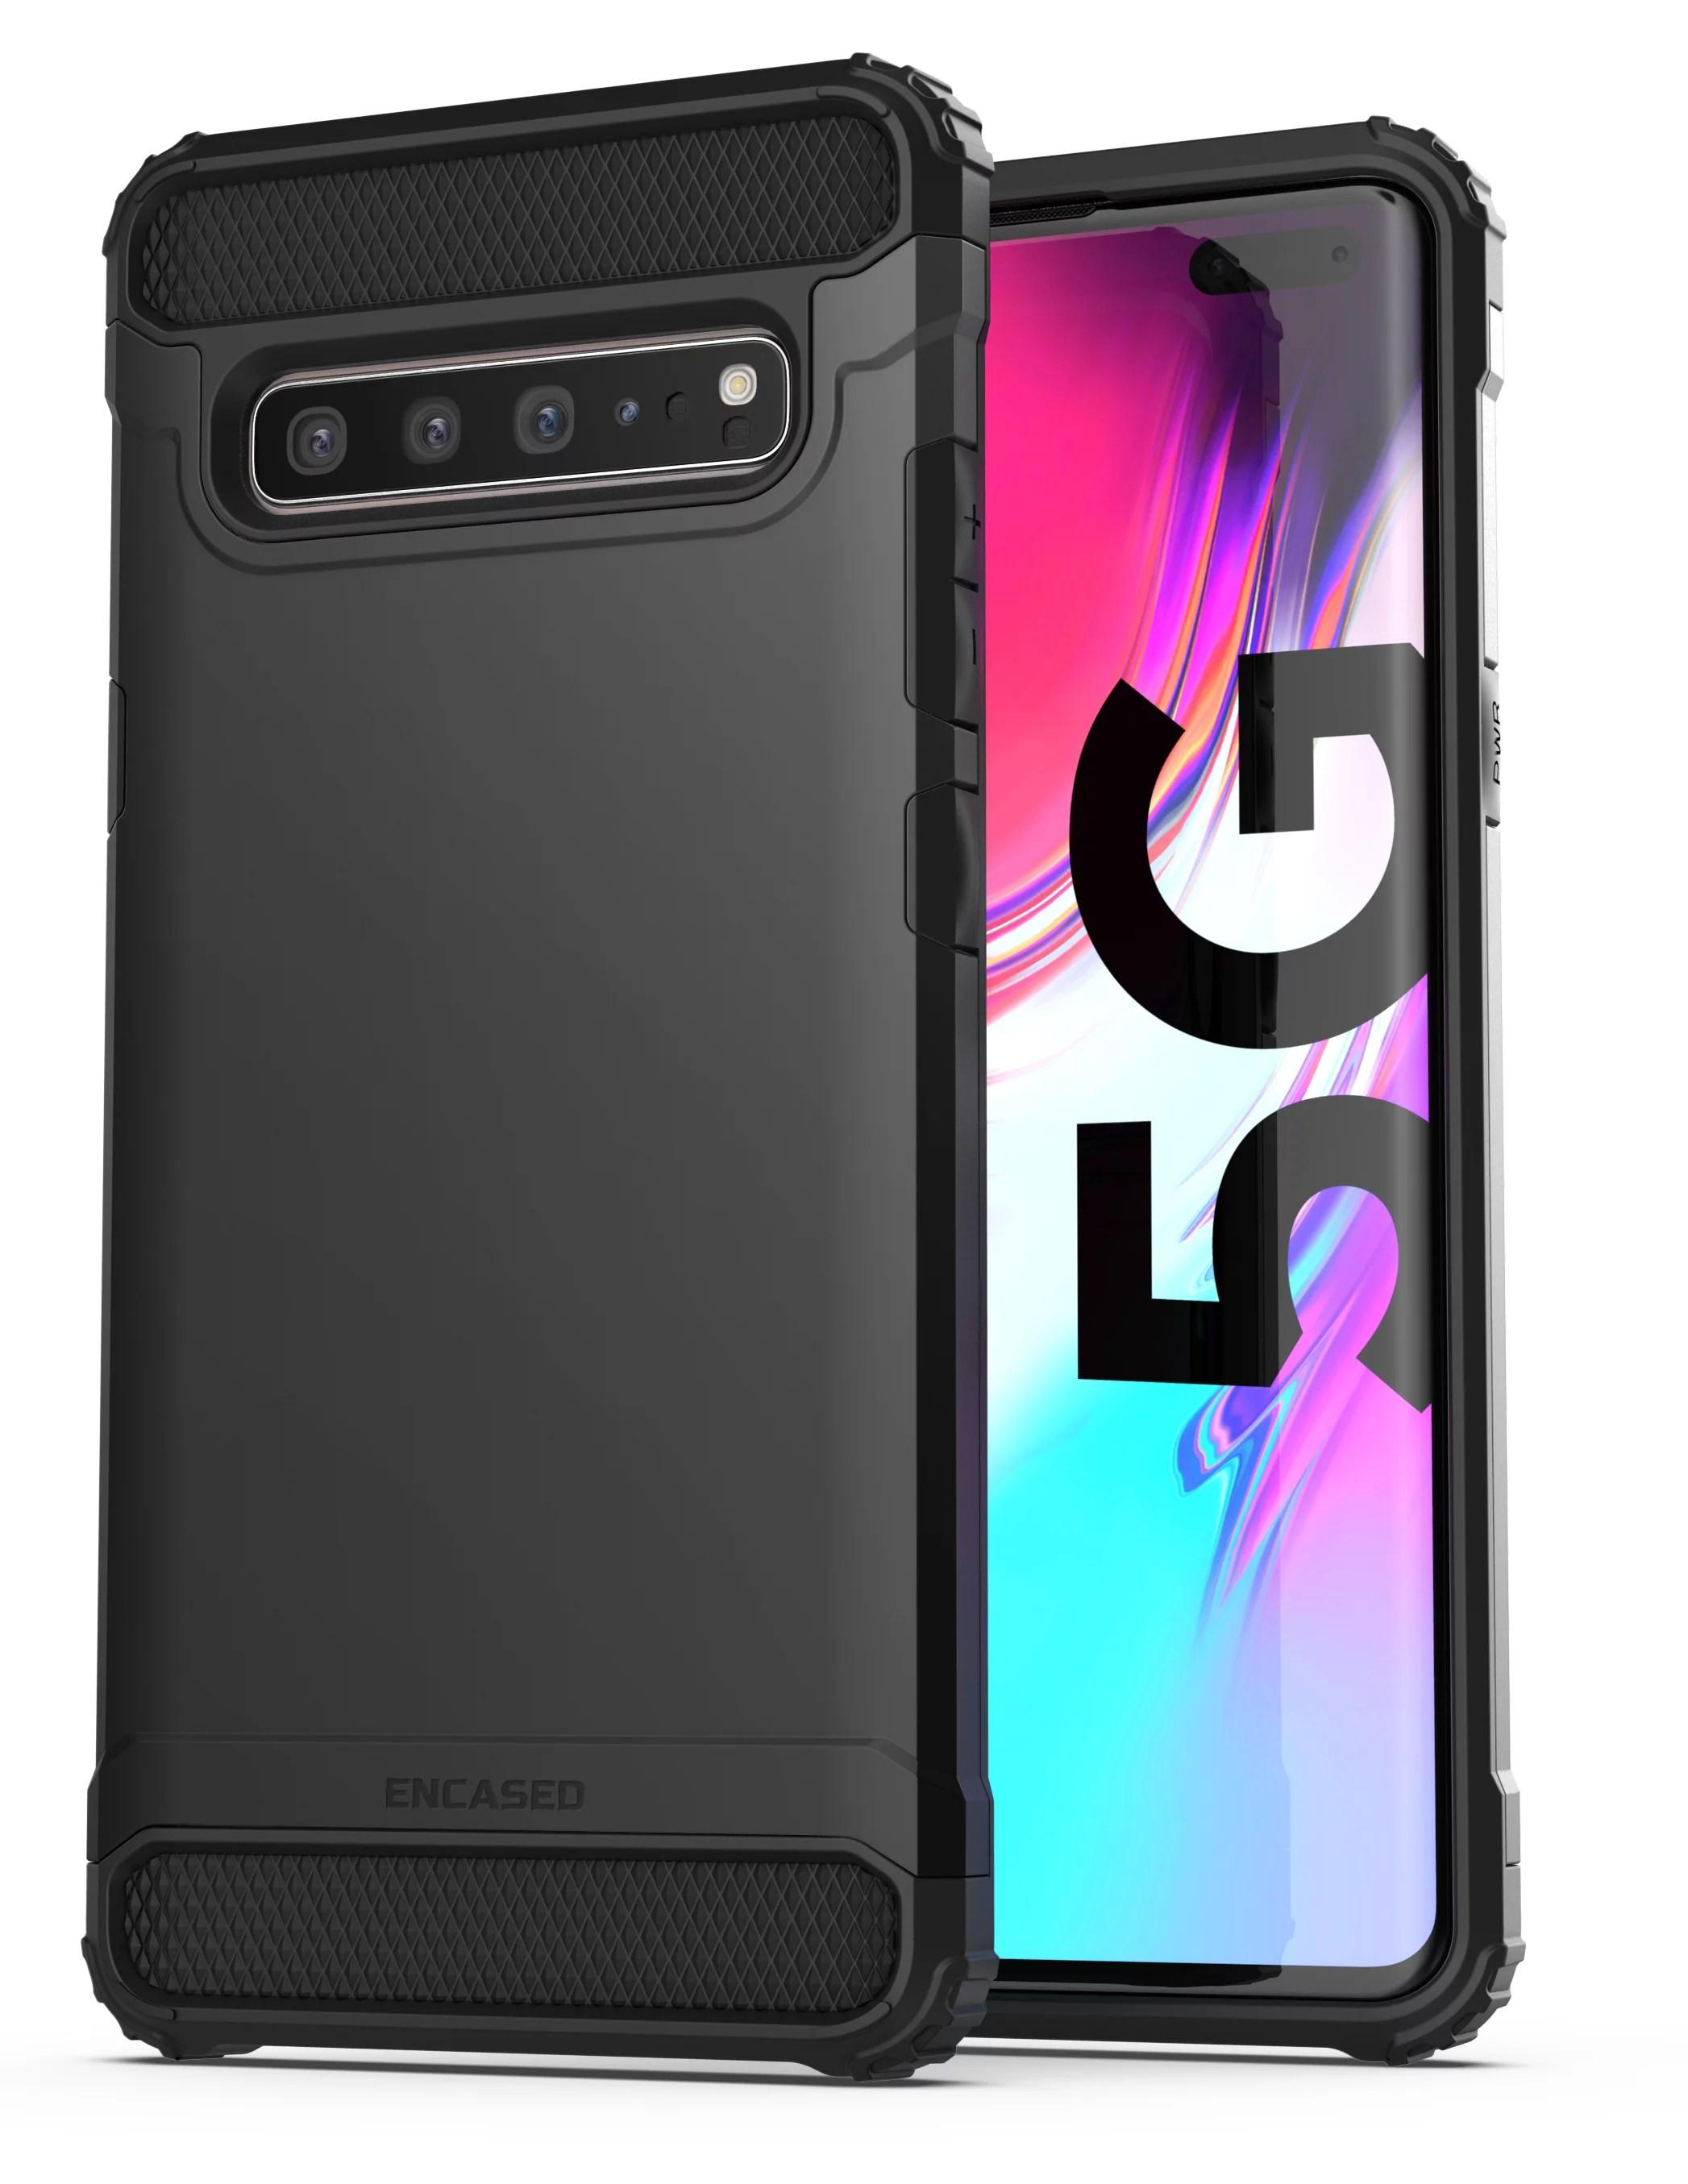 Encased Heavy Duty Galaxy S10 5G Case (Scorpio Armor) Military Grade Rugged Protective Cover for Samsung S10 5G (Black) - Walmart.com - Walmart.com